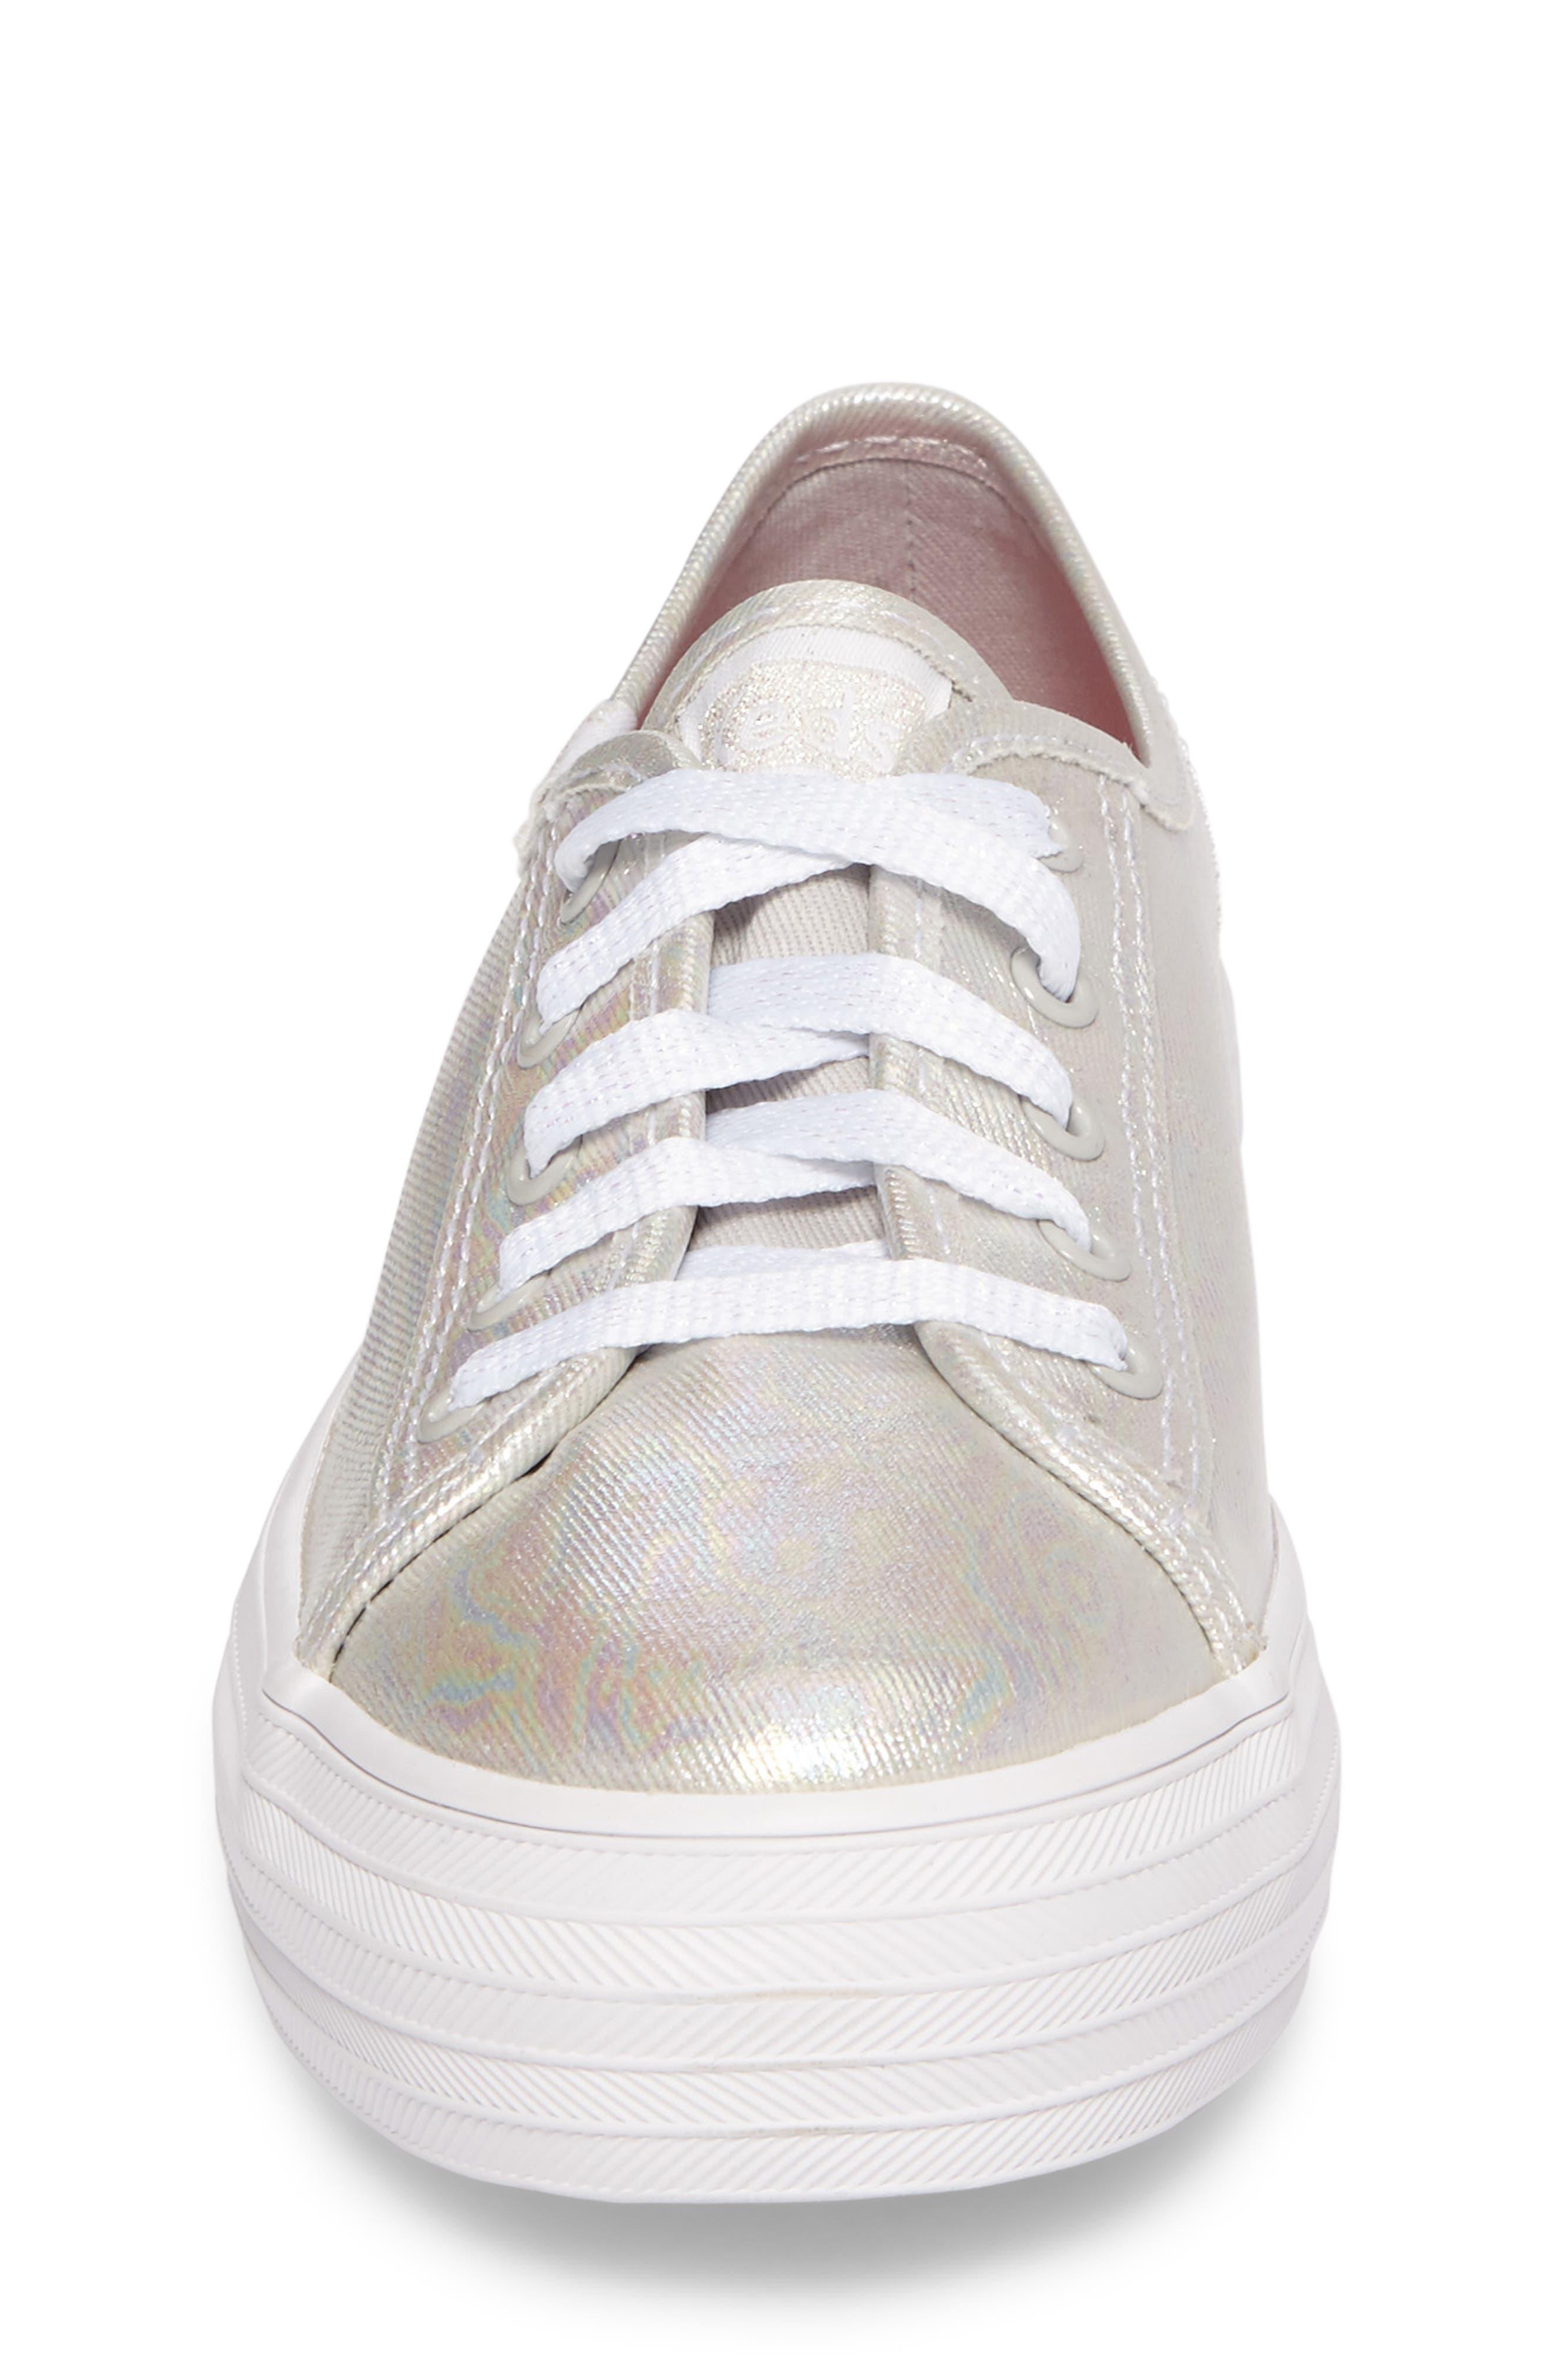 Triple Kick Platform Sneaker,                             Alternate thumbnail 4, color,                             020